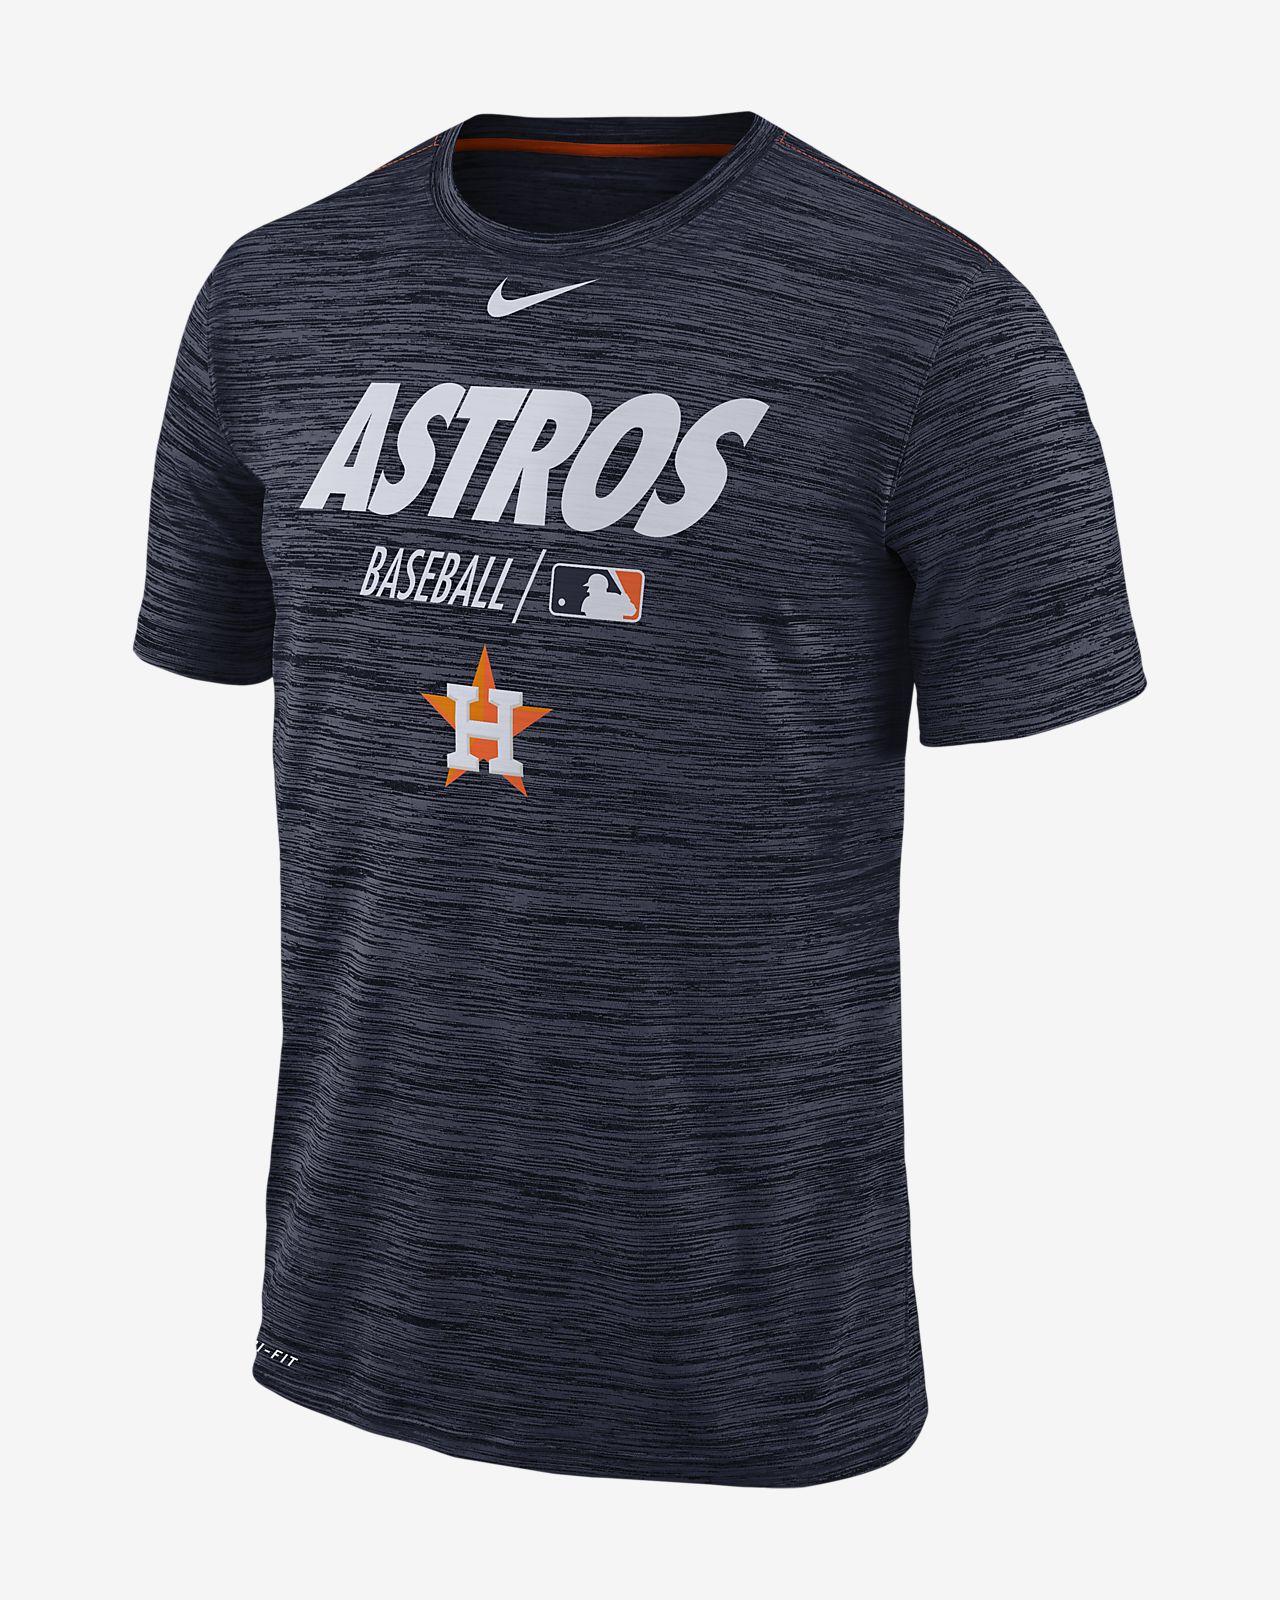 8afa2eb9 Nike Dri-FIT AC Velocity Team Issue (MLB Astros) Men's T-Shirt. Nike.com